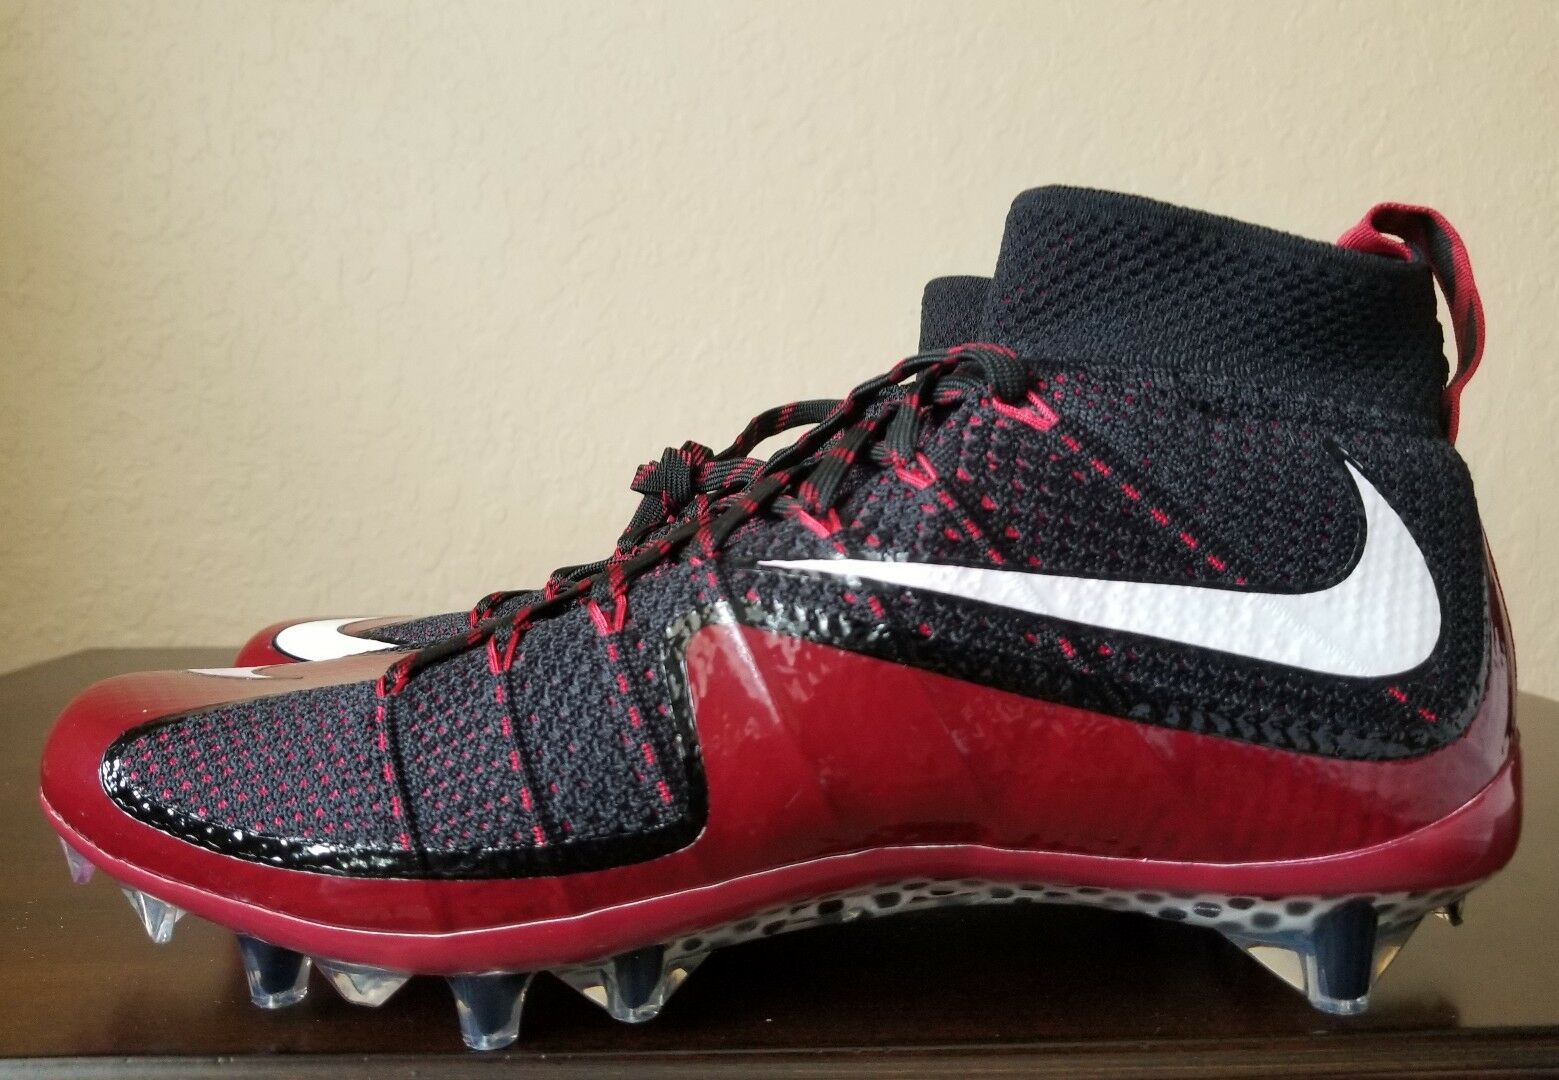 NEW Nike Vapor Men's Untouchable Football Cleats #CUL8R 707455-001 Men's Vapor Sz. 9.5 a1e6c6